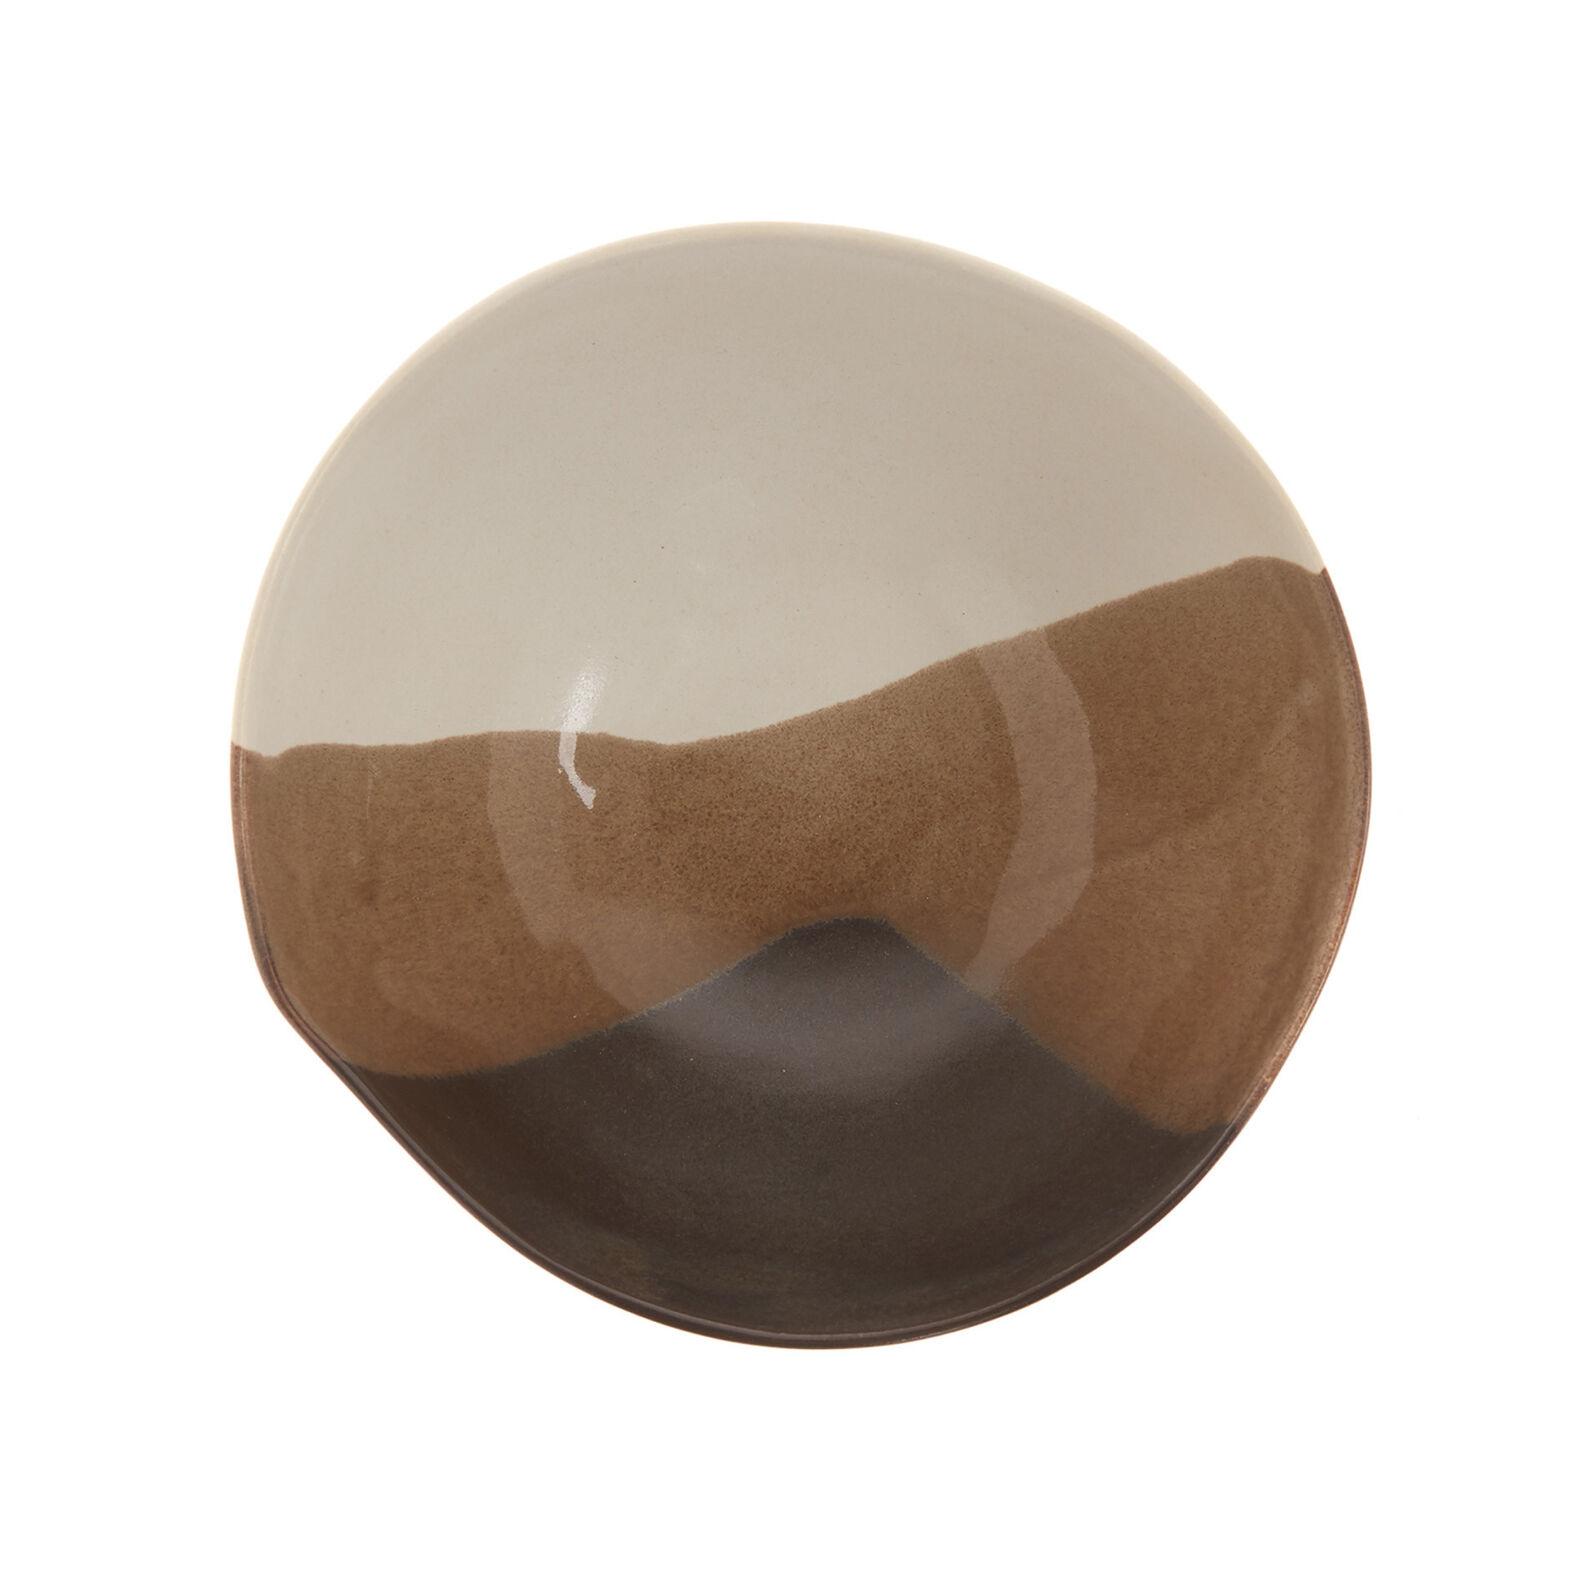 Terra small ceramic bowl